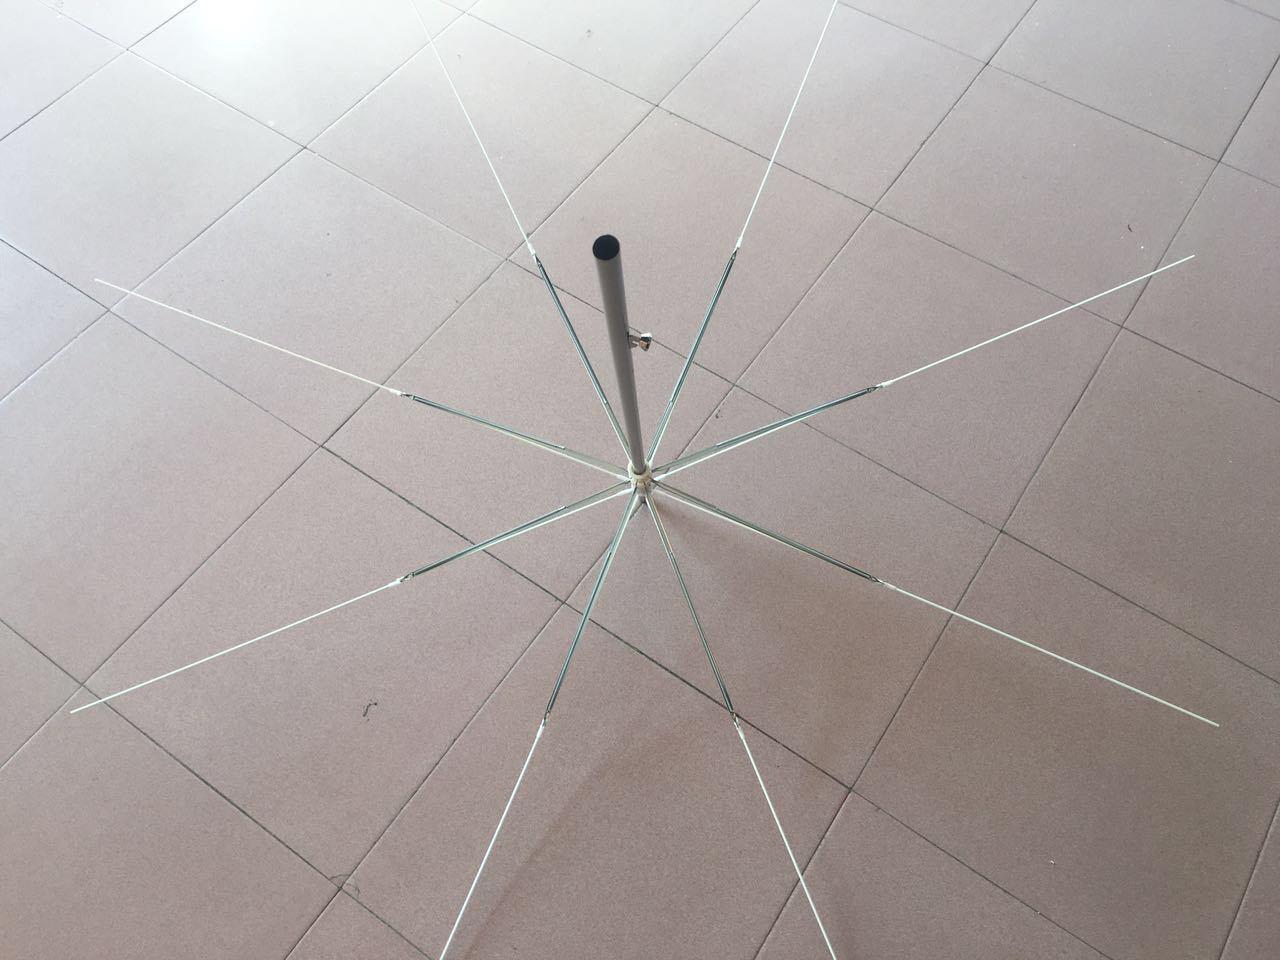 White Fiber Big Spring Umbrella